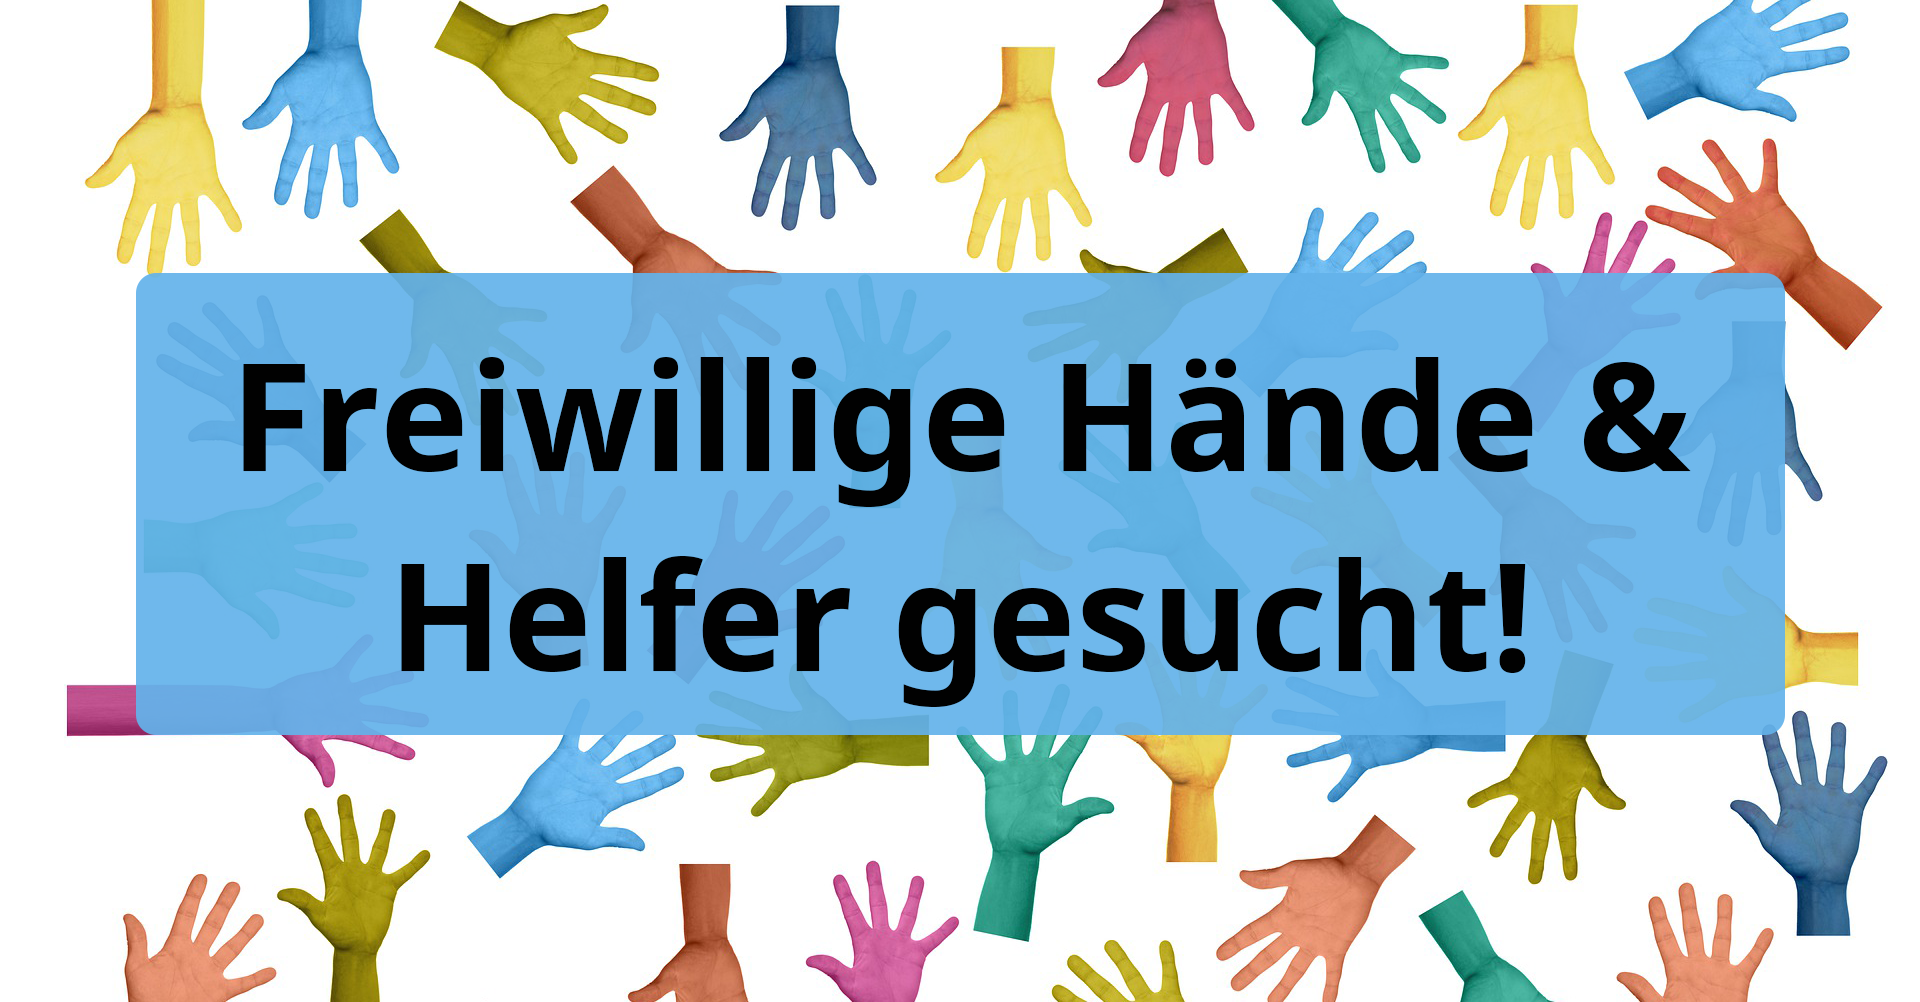 volunteers-4937539_1920